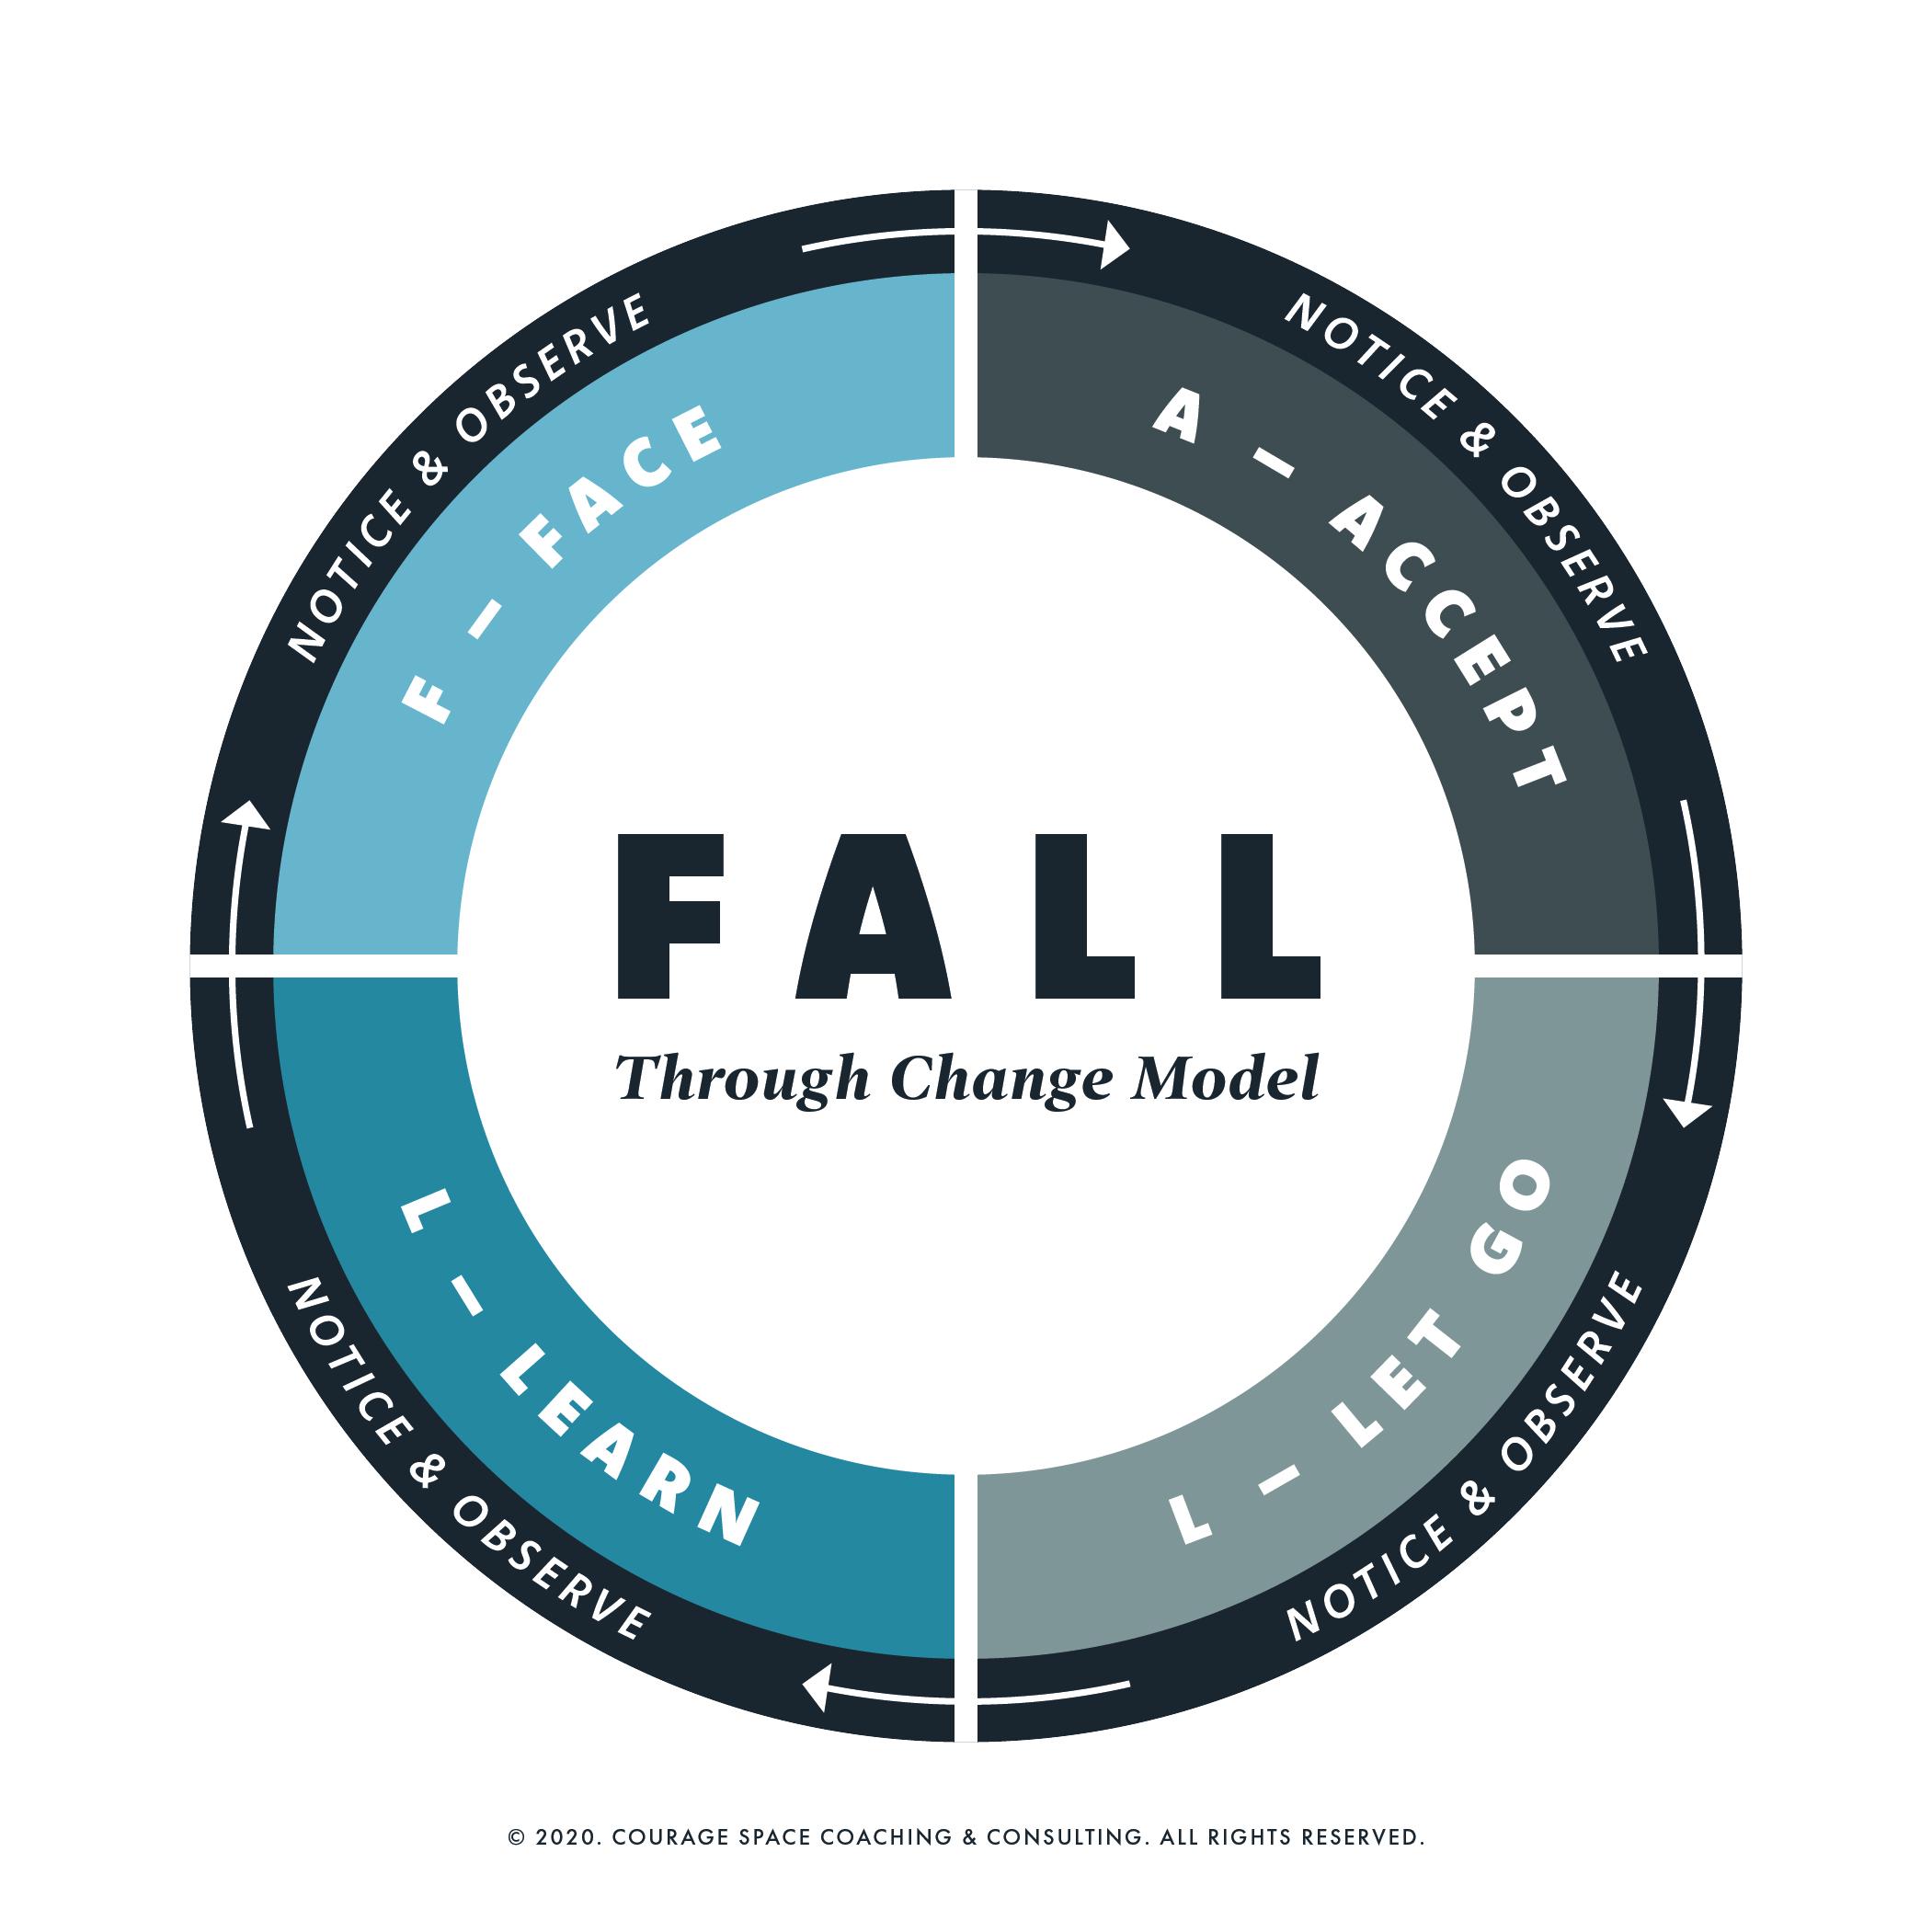 Fall Through Change - Change Model